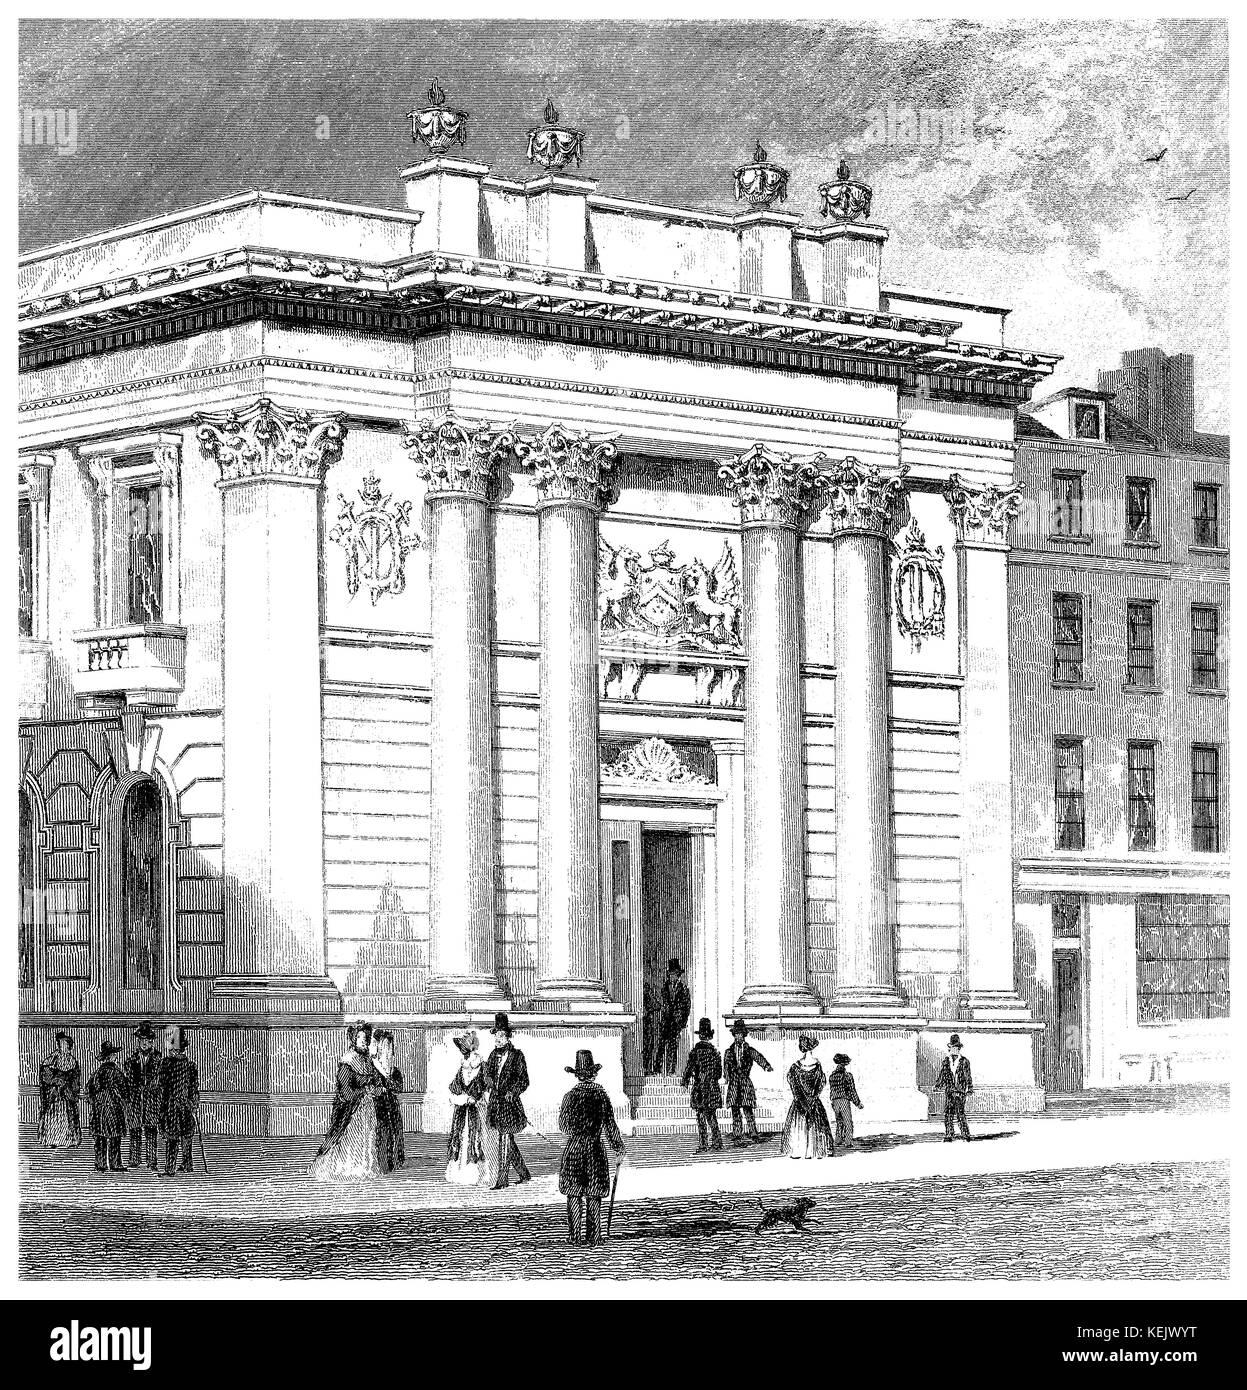 1853 engraving of Gresham College in Gresham Street, London. - Stock Image